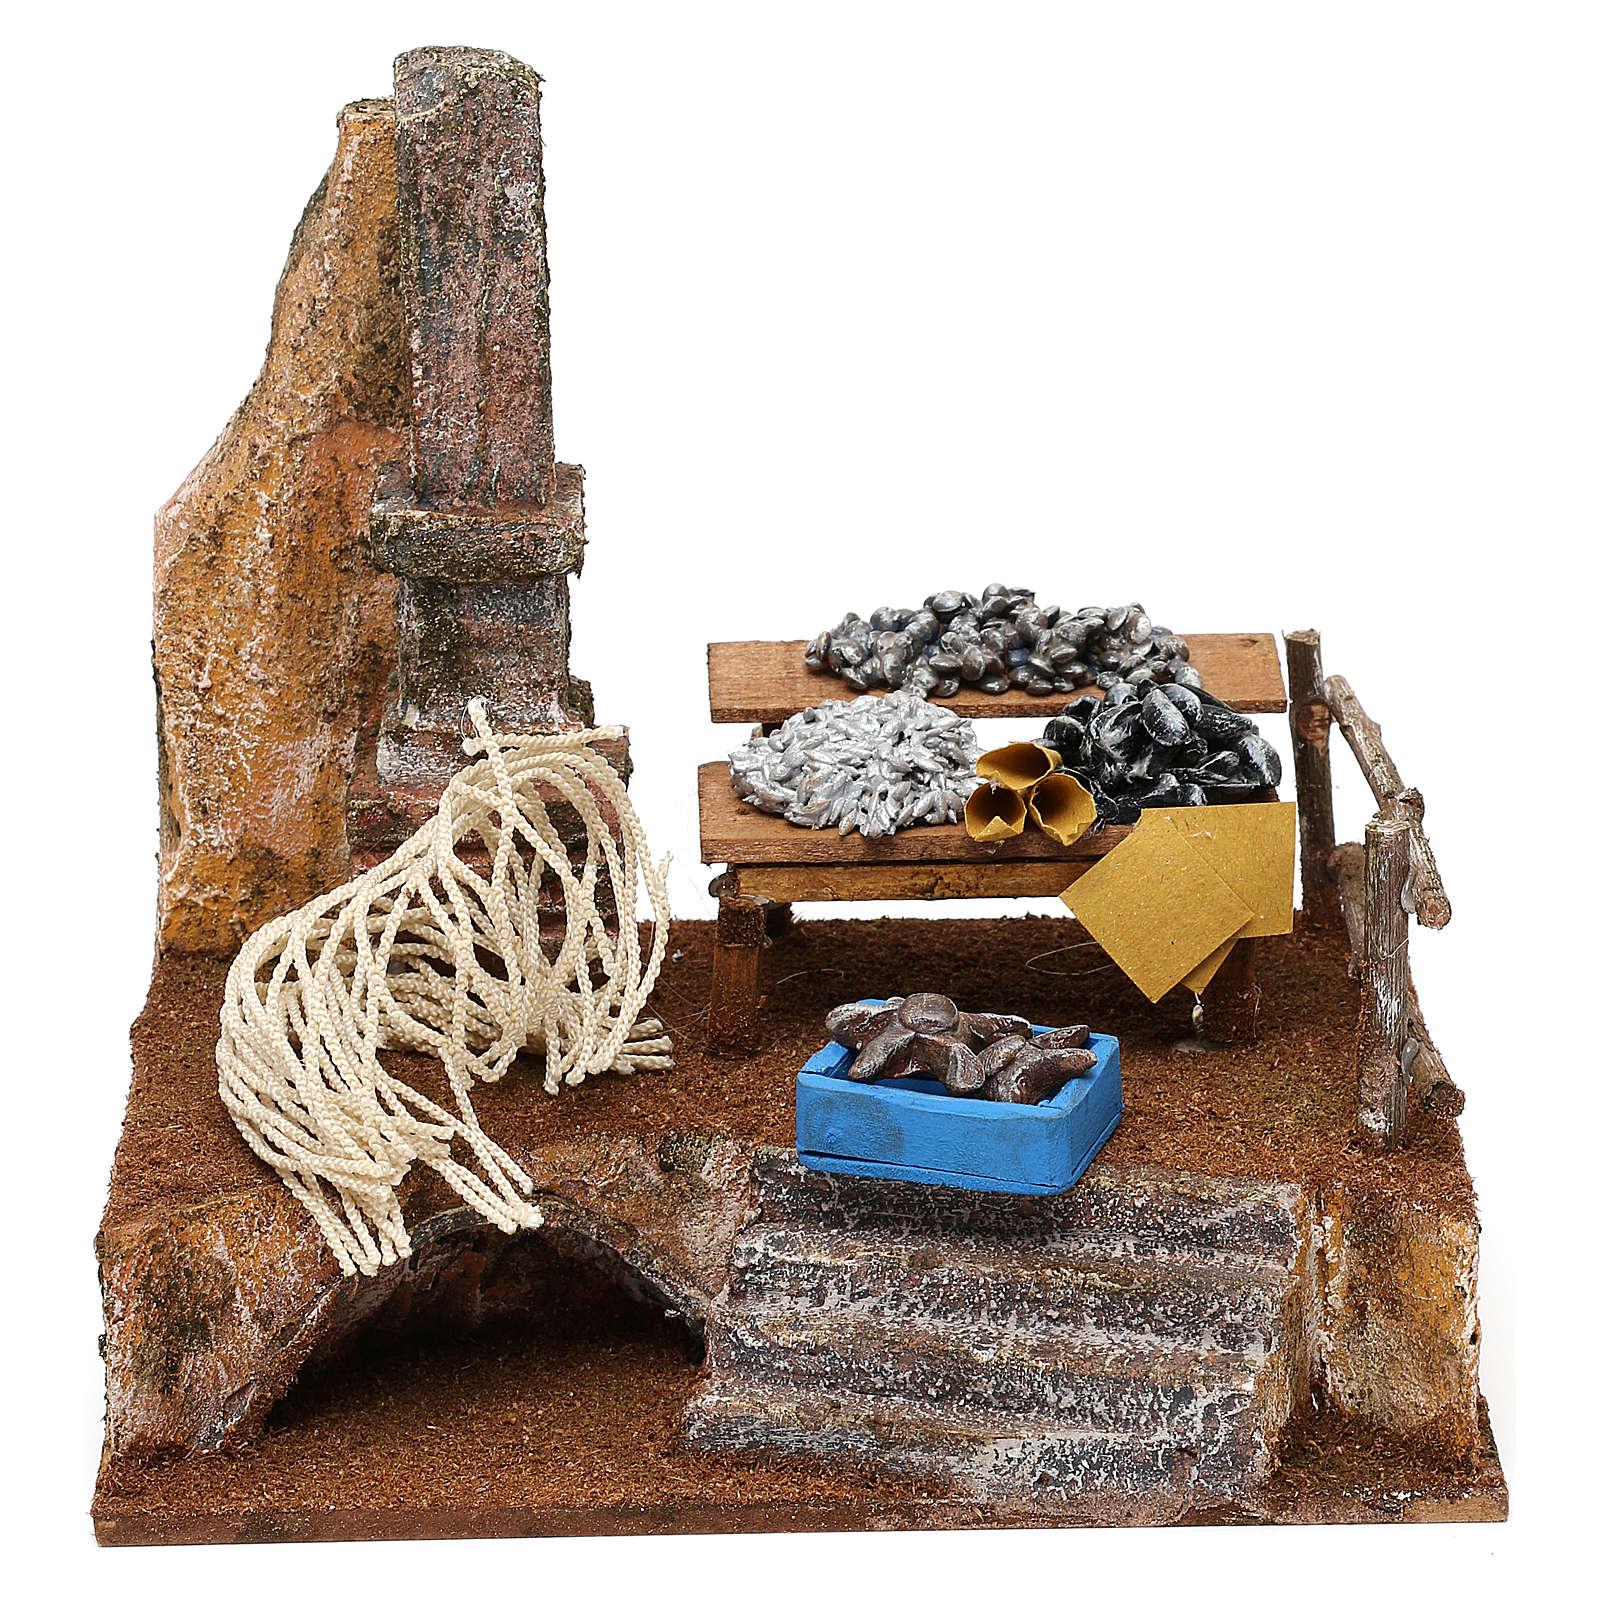 Fishmonger setting for 10 cm Nativity scene, 20x20x15 cm 4